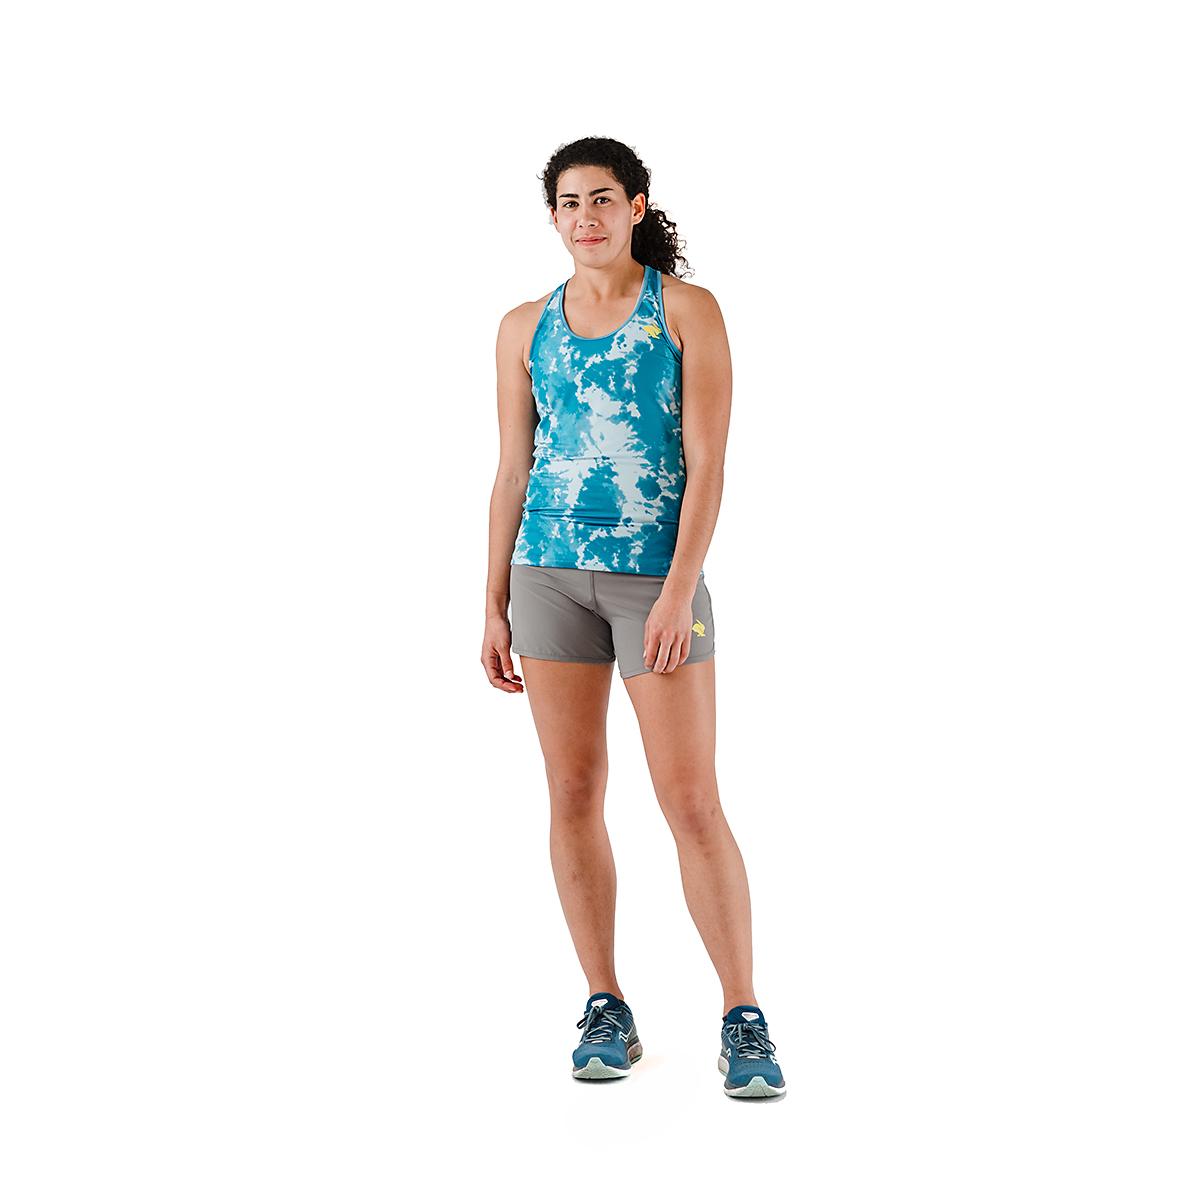 Women's Rabbit Bunny Hop Tank - JackRabbit Exclusive  - Color: Ipanema Tie Dye - Size: XS, Ipanema Tie Dye, large, image 4